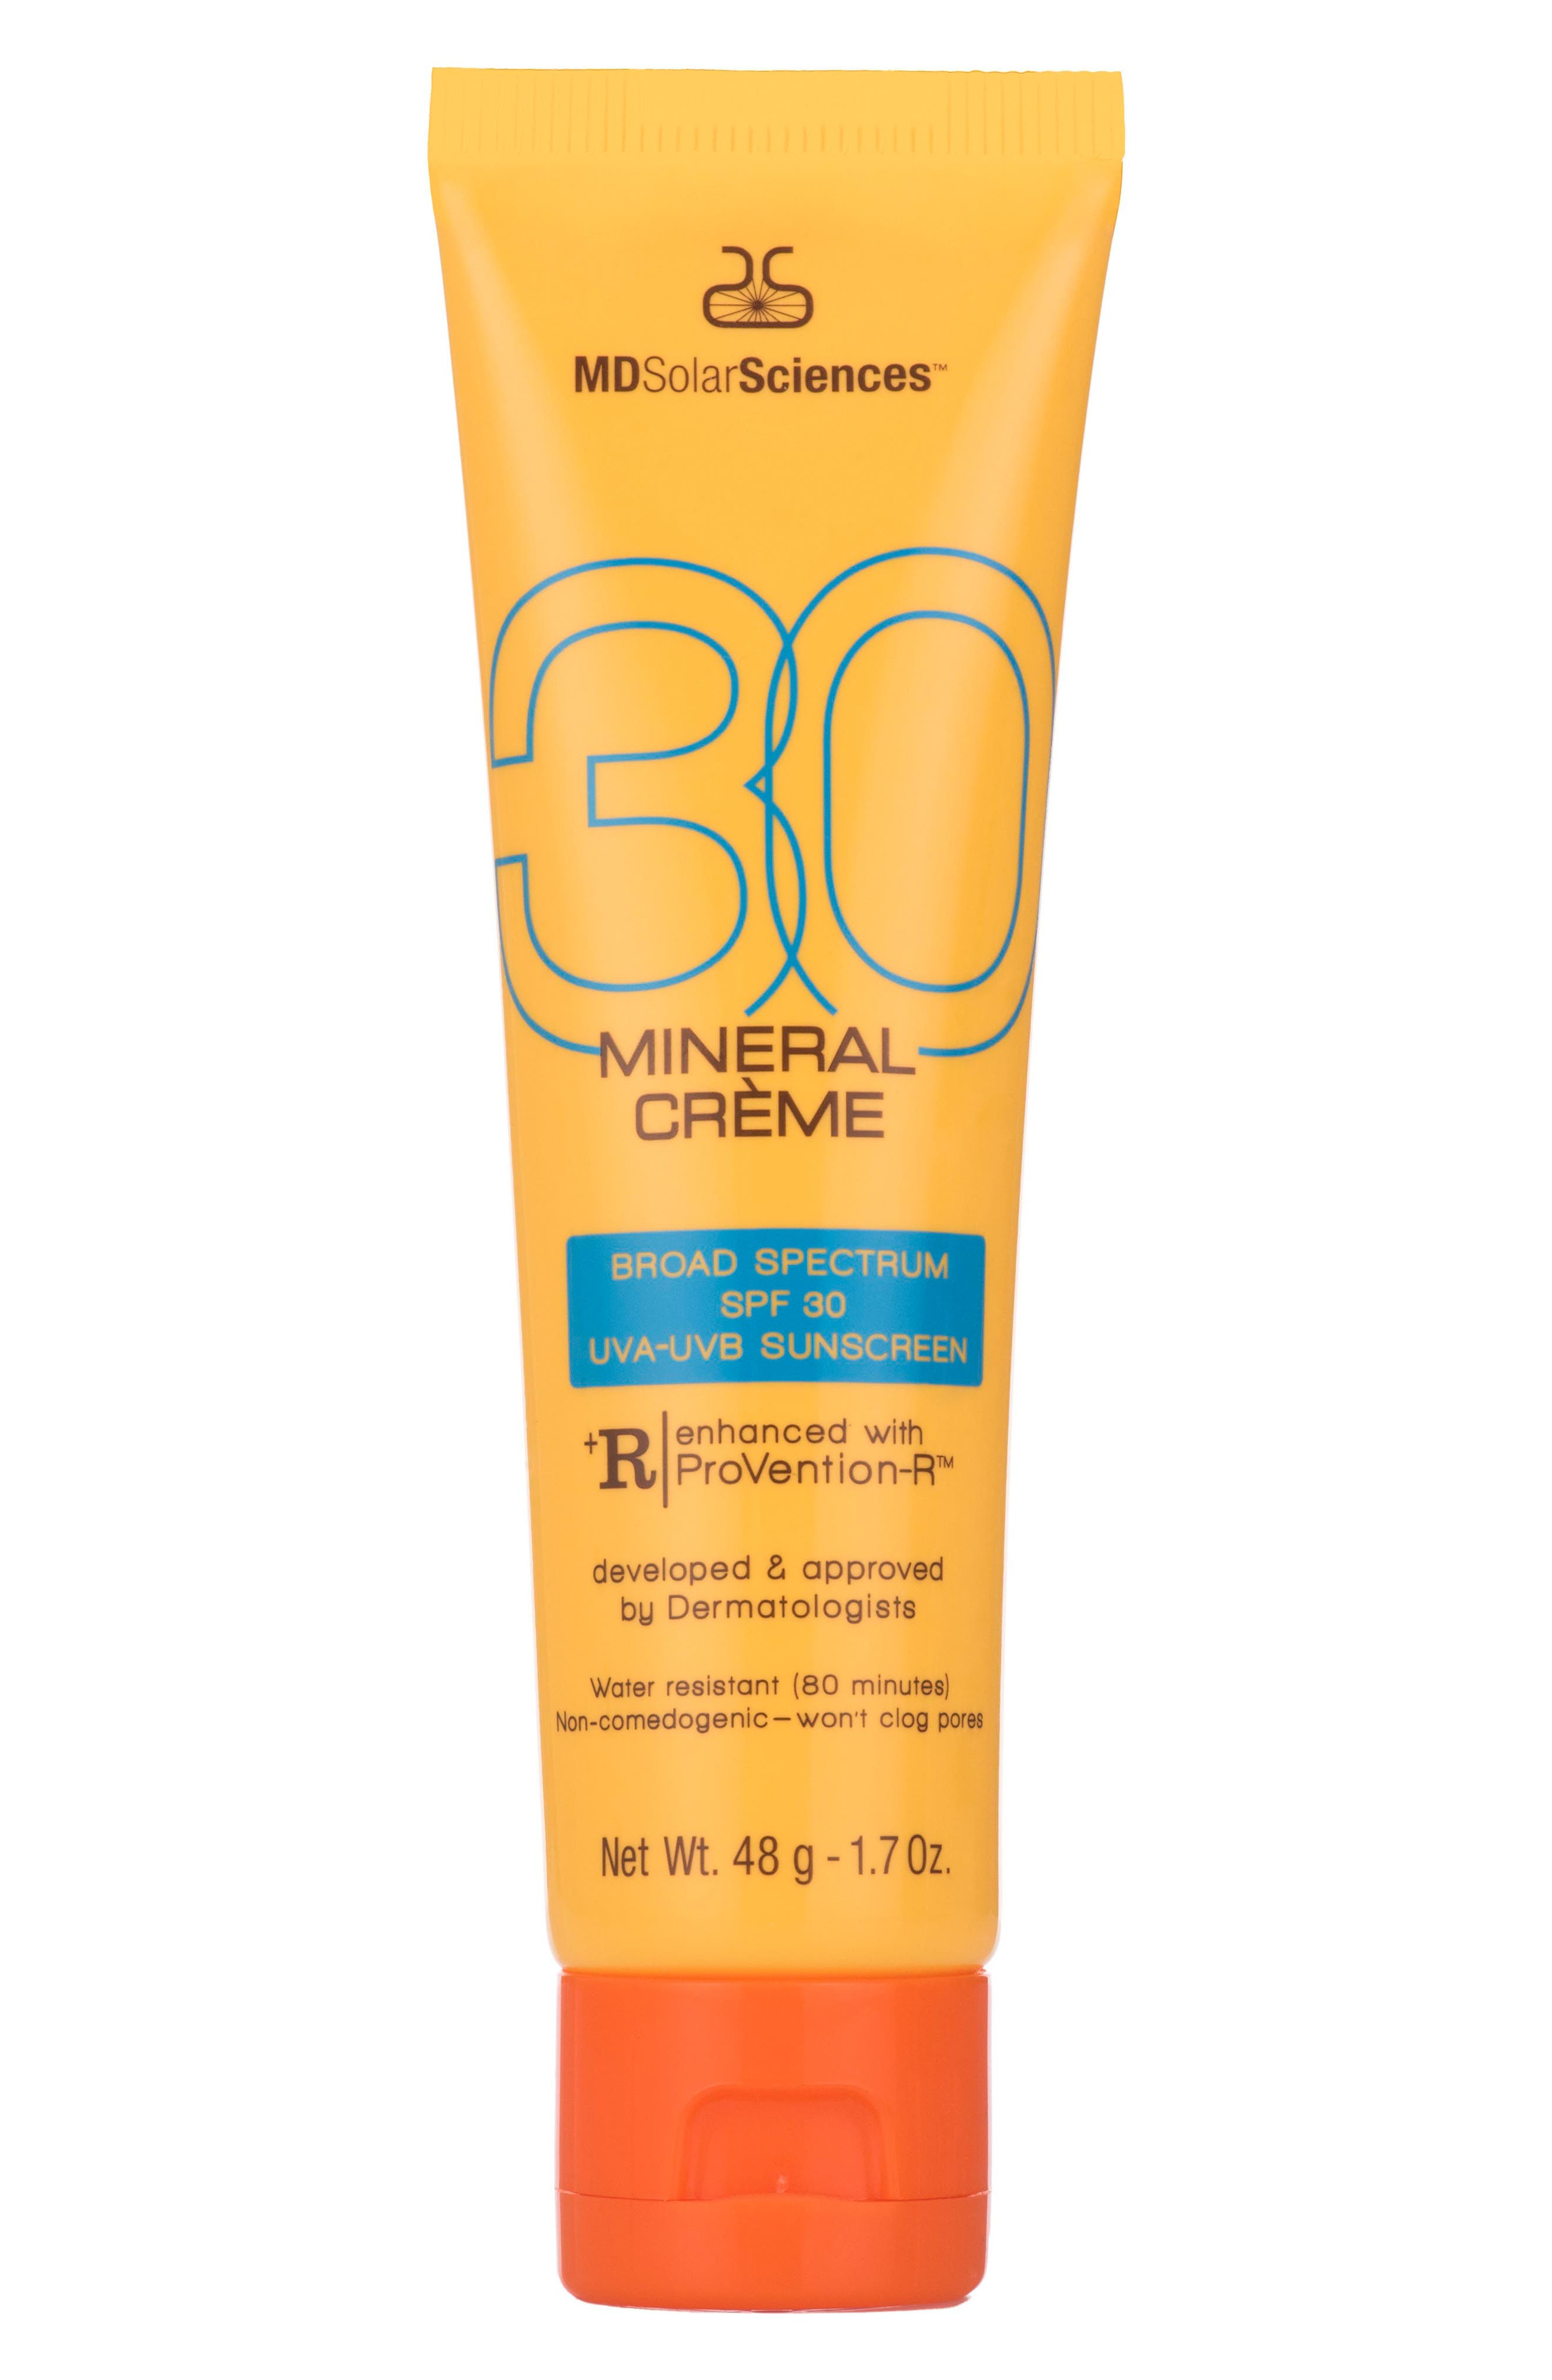 MDSOLARSCIENCES Mineral Crème Broad Spectrum SPF 30 Sunscreen